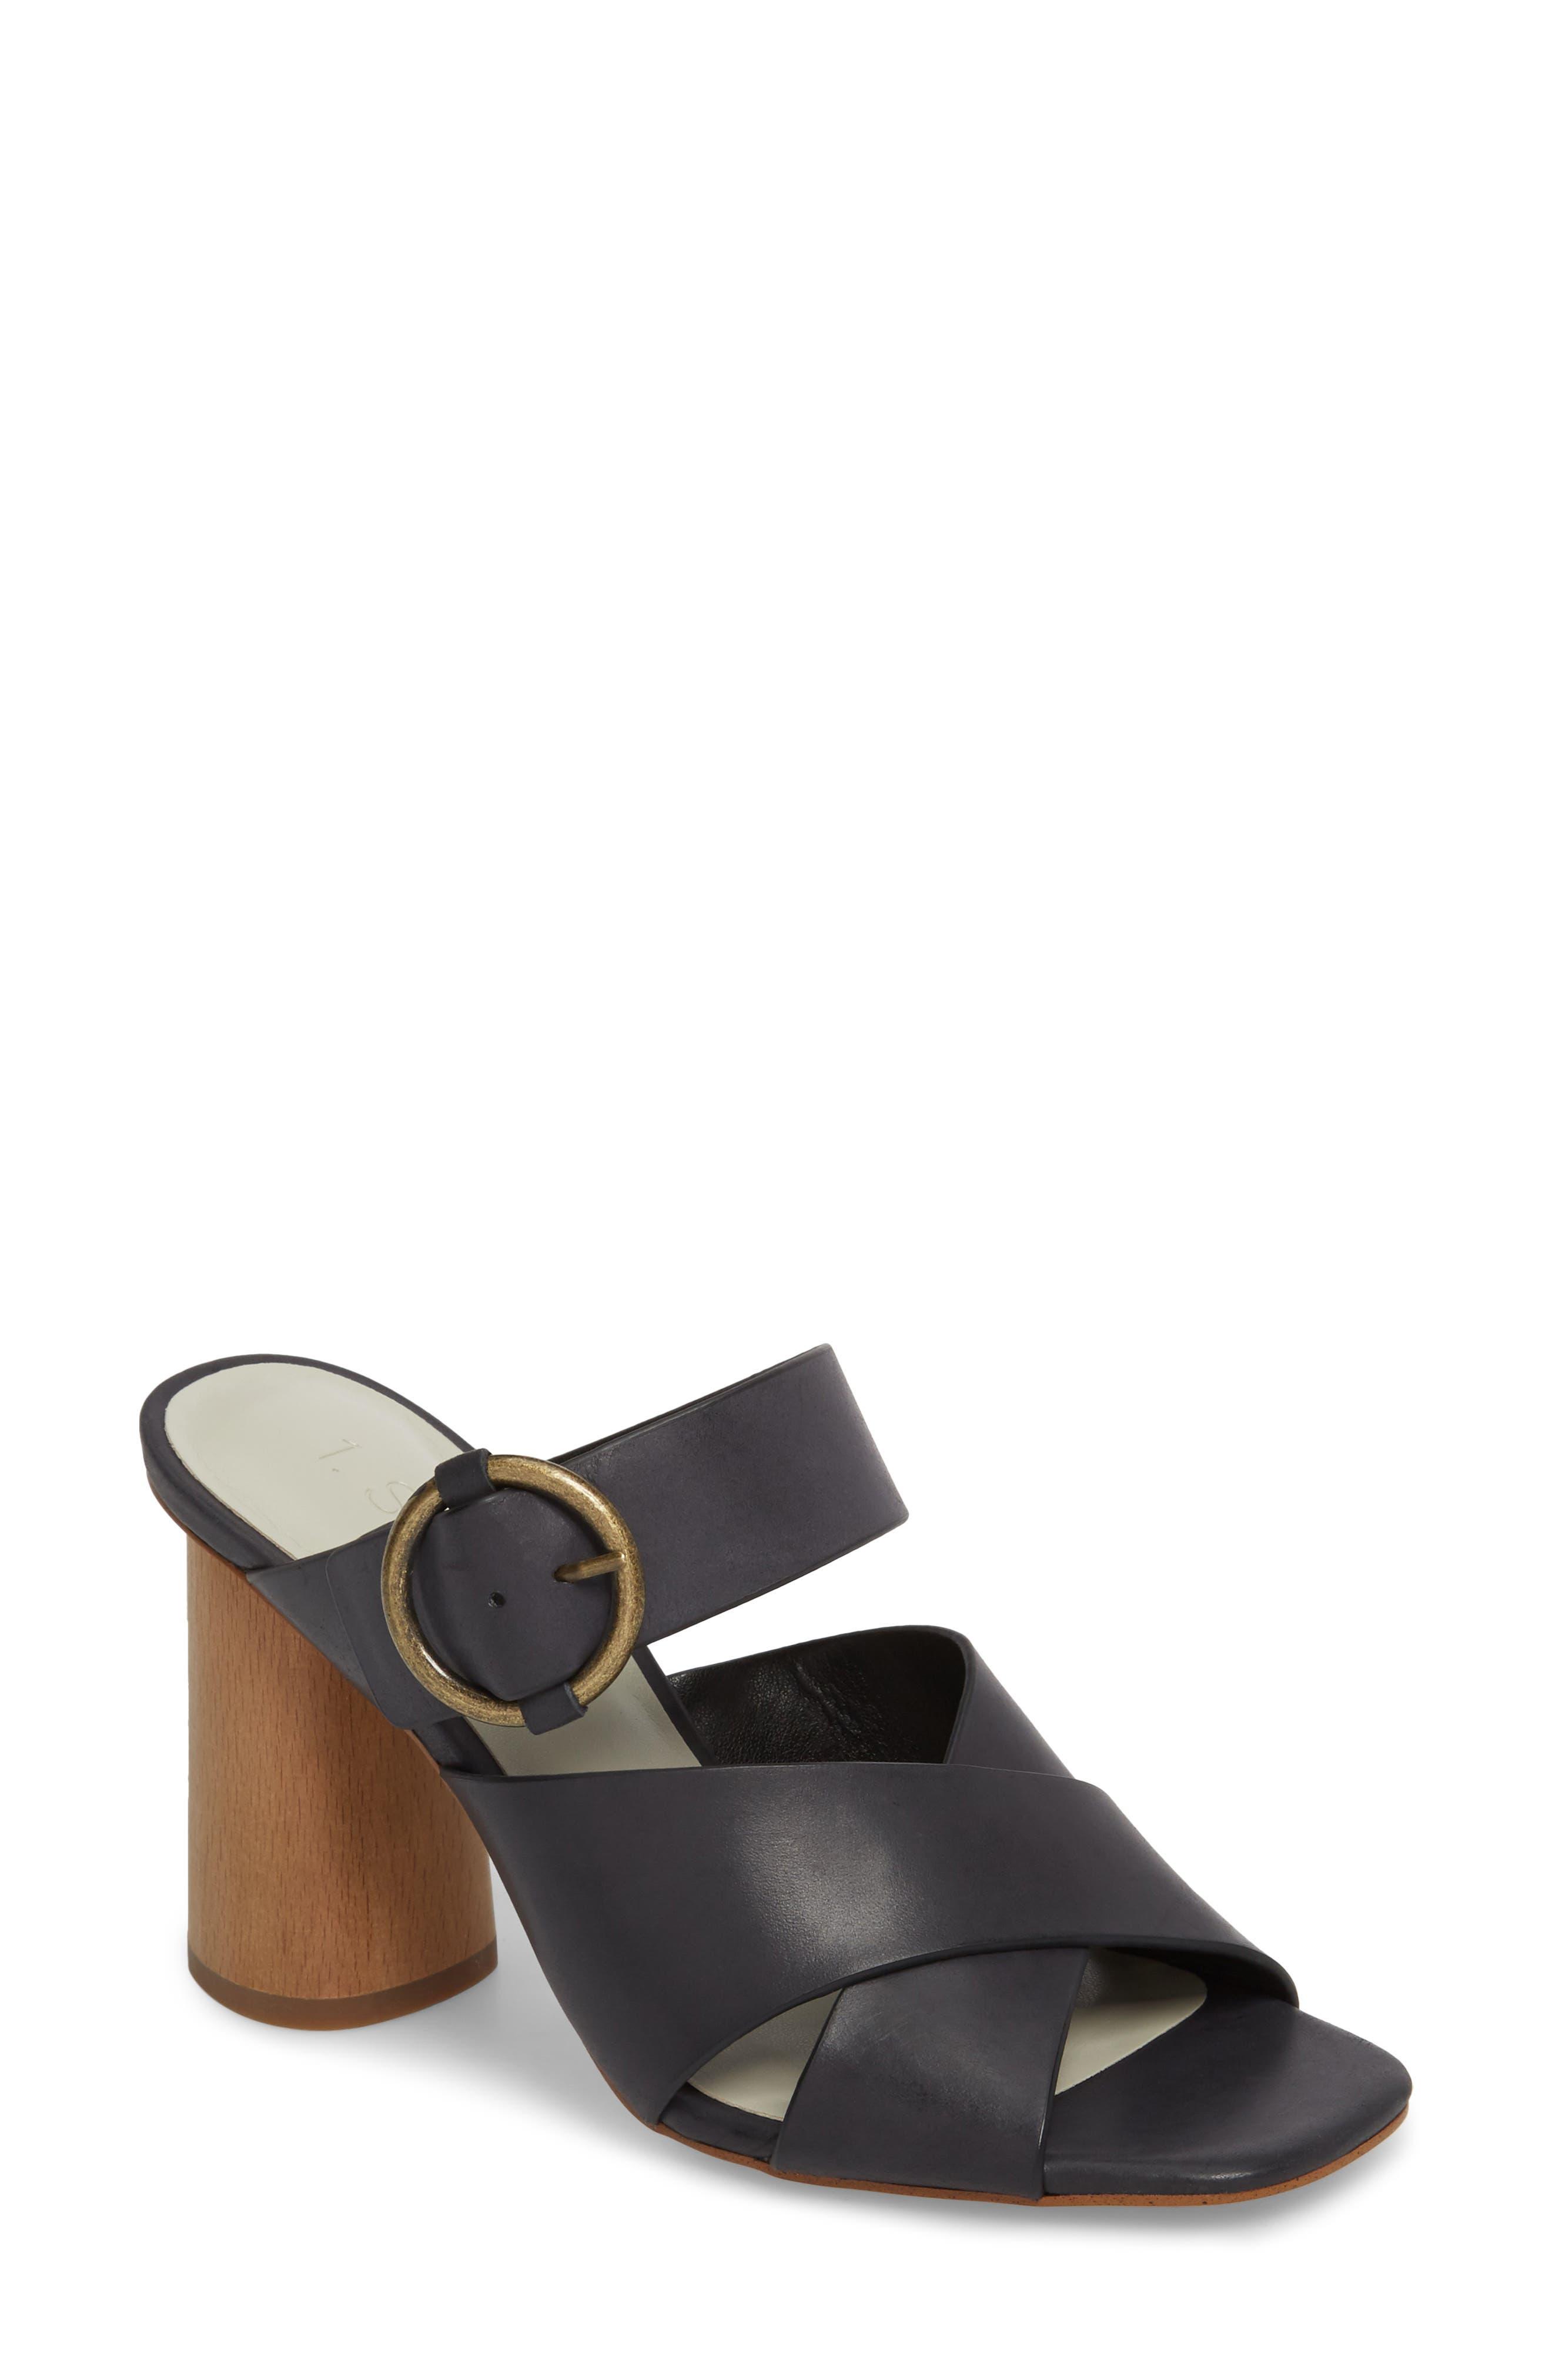 Icendra Flared Heel Mule Sandal,                         Main,                         color, BLACK LEATHER